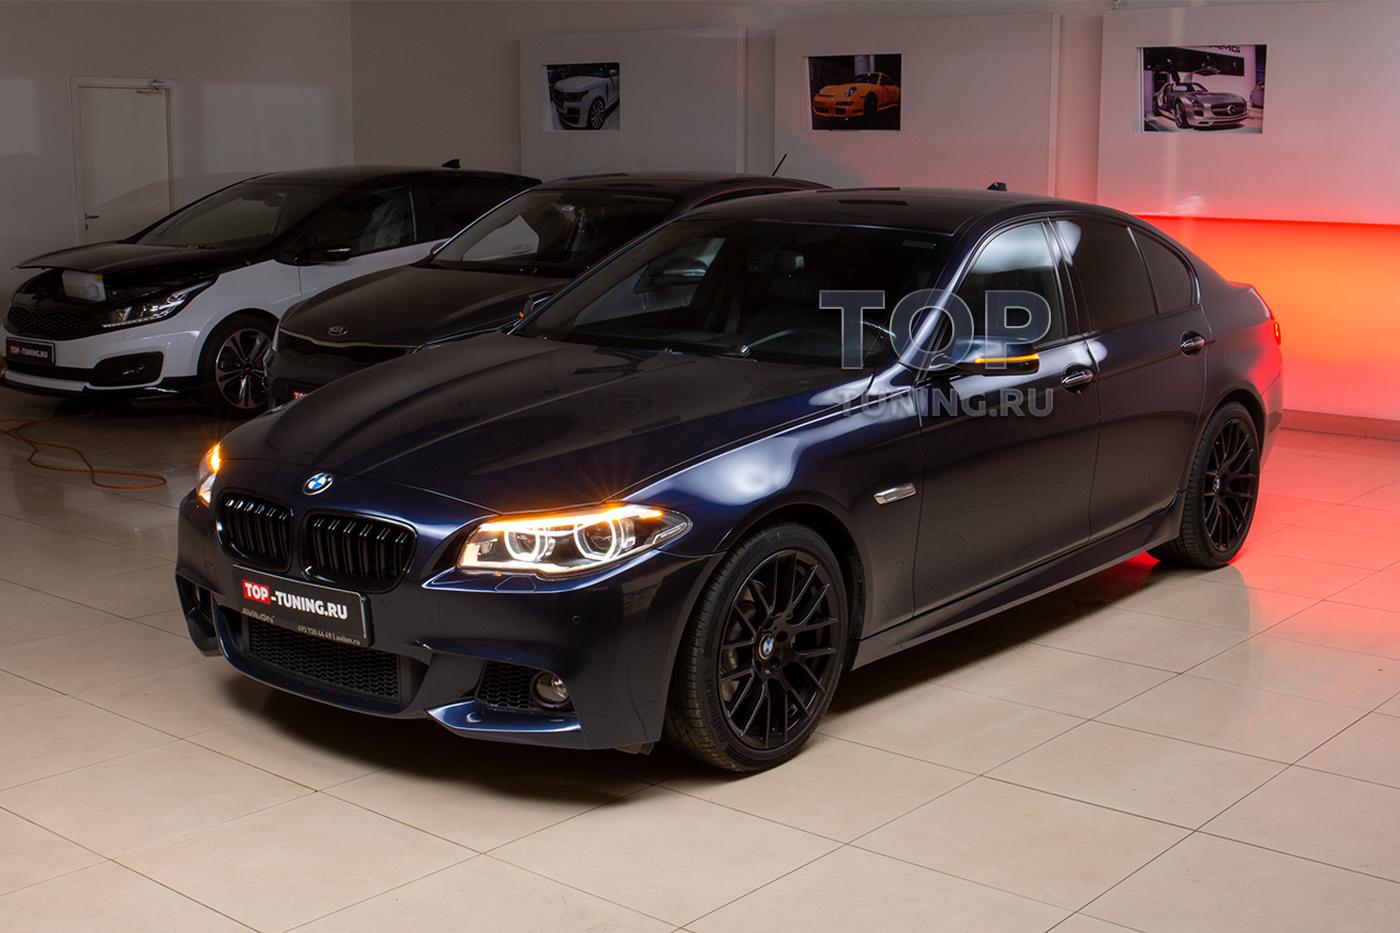 Защита и восстановление прозрачности фар на BMW